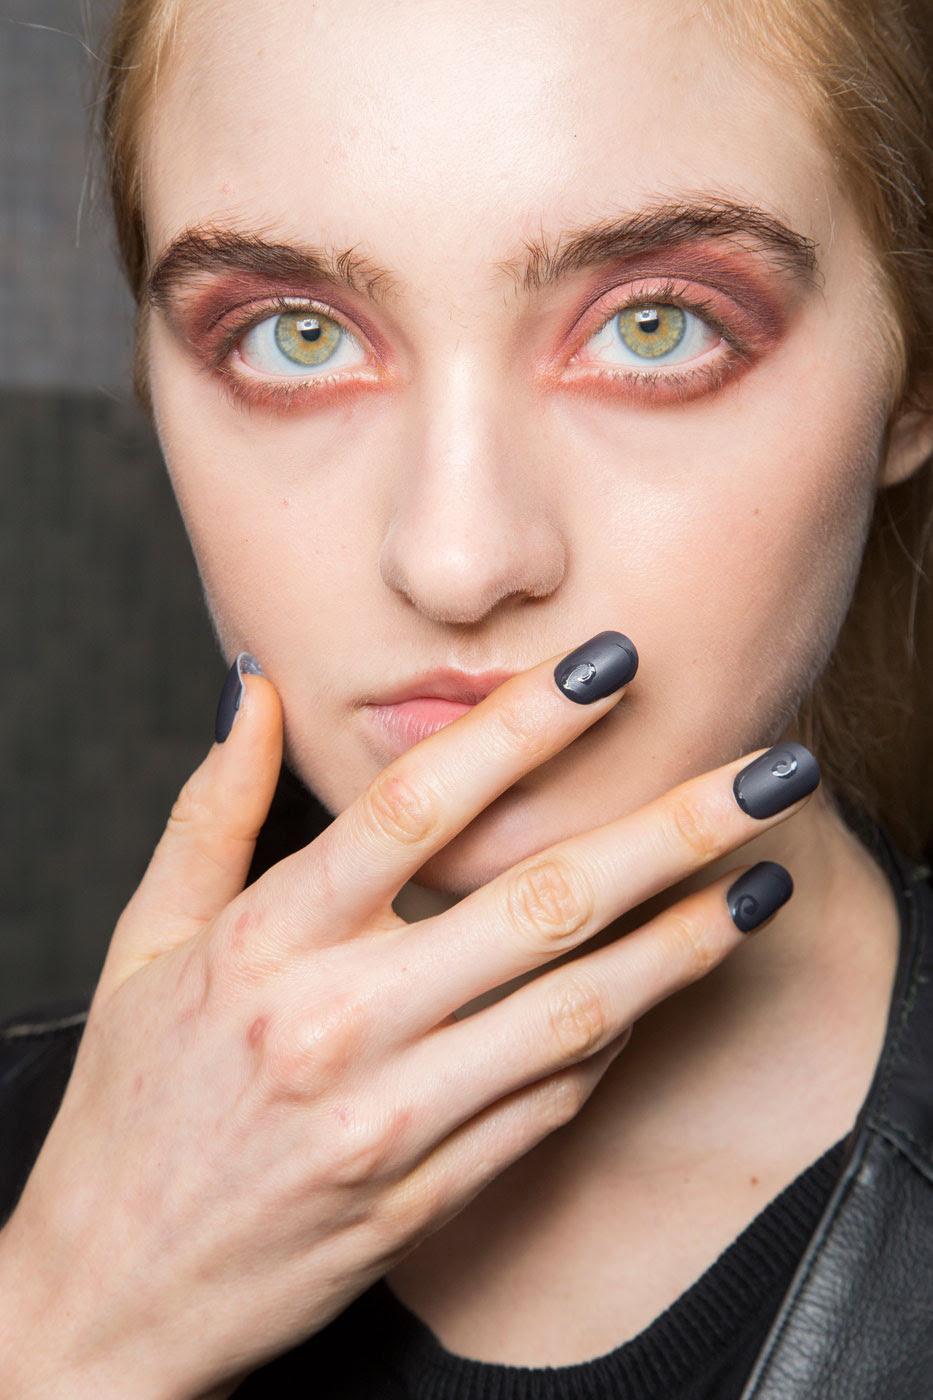 Antonio Marras Fall 2015   The Latest Nail Art Trends ...